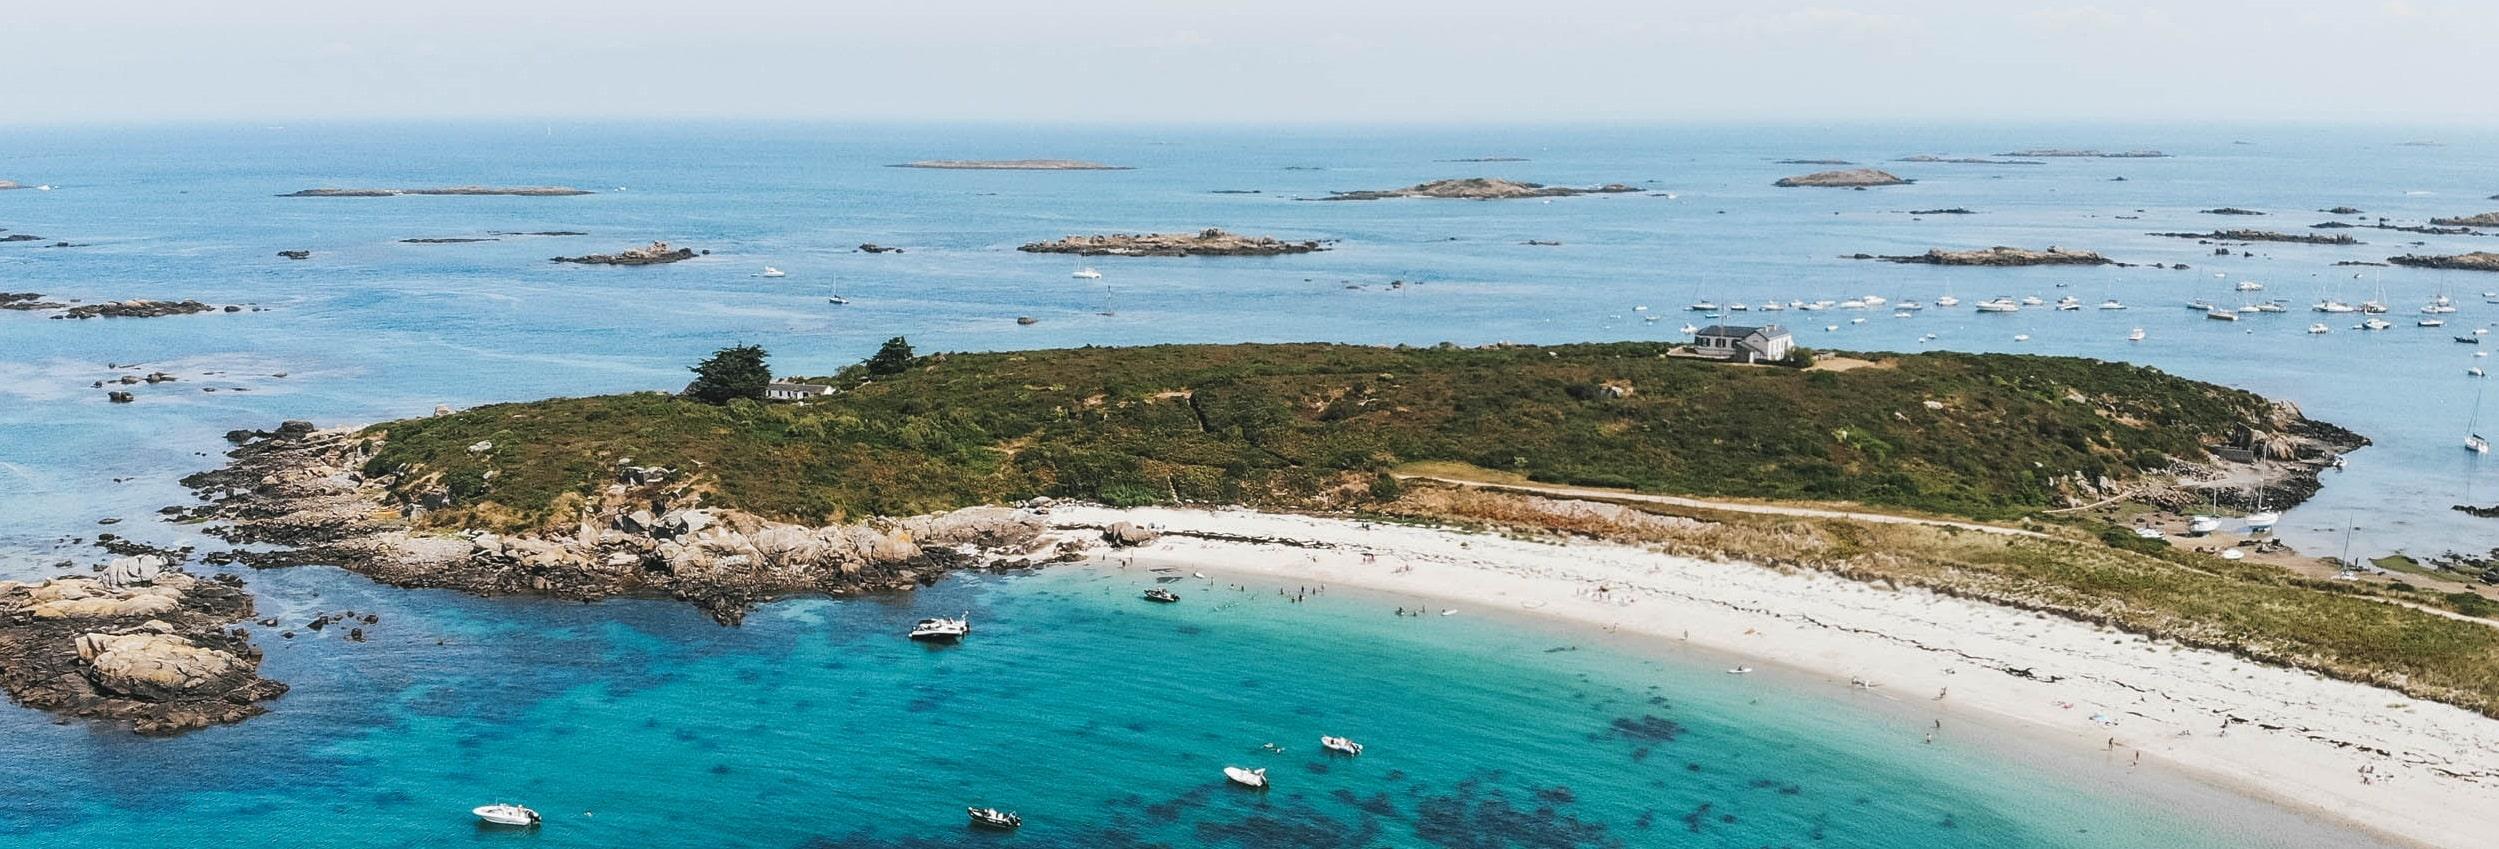 îles chausey drône